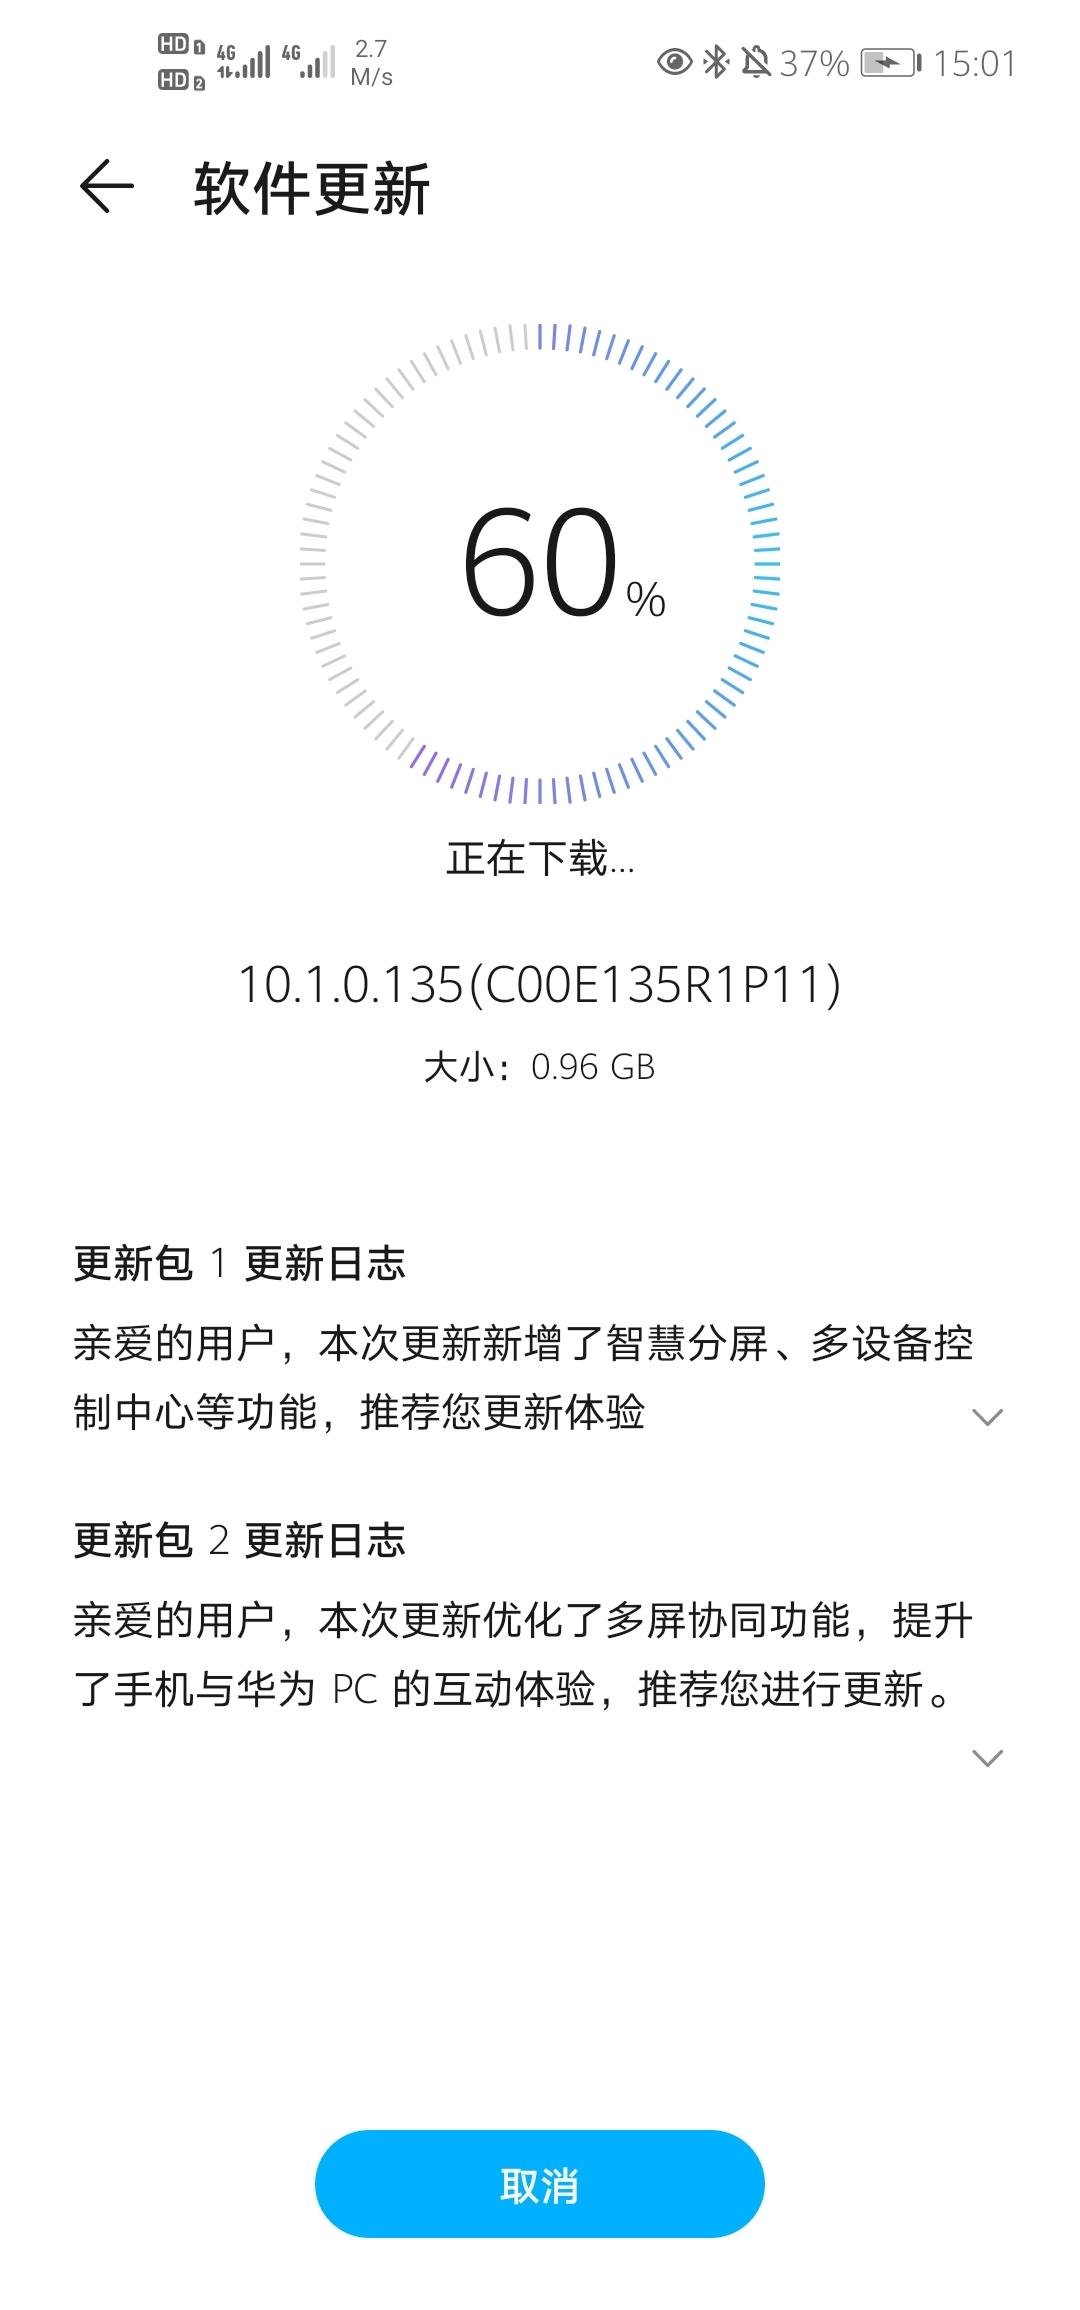 Screenshot_20200512_150135_com.huawei.android.hwouc.jpg